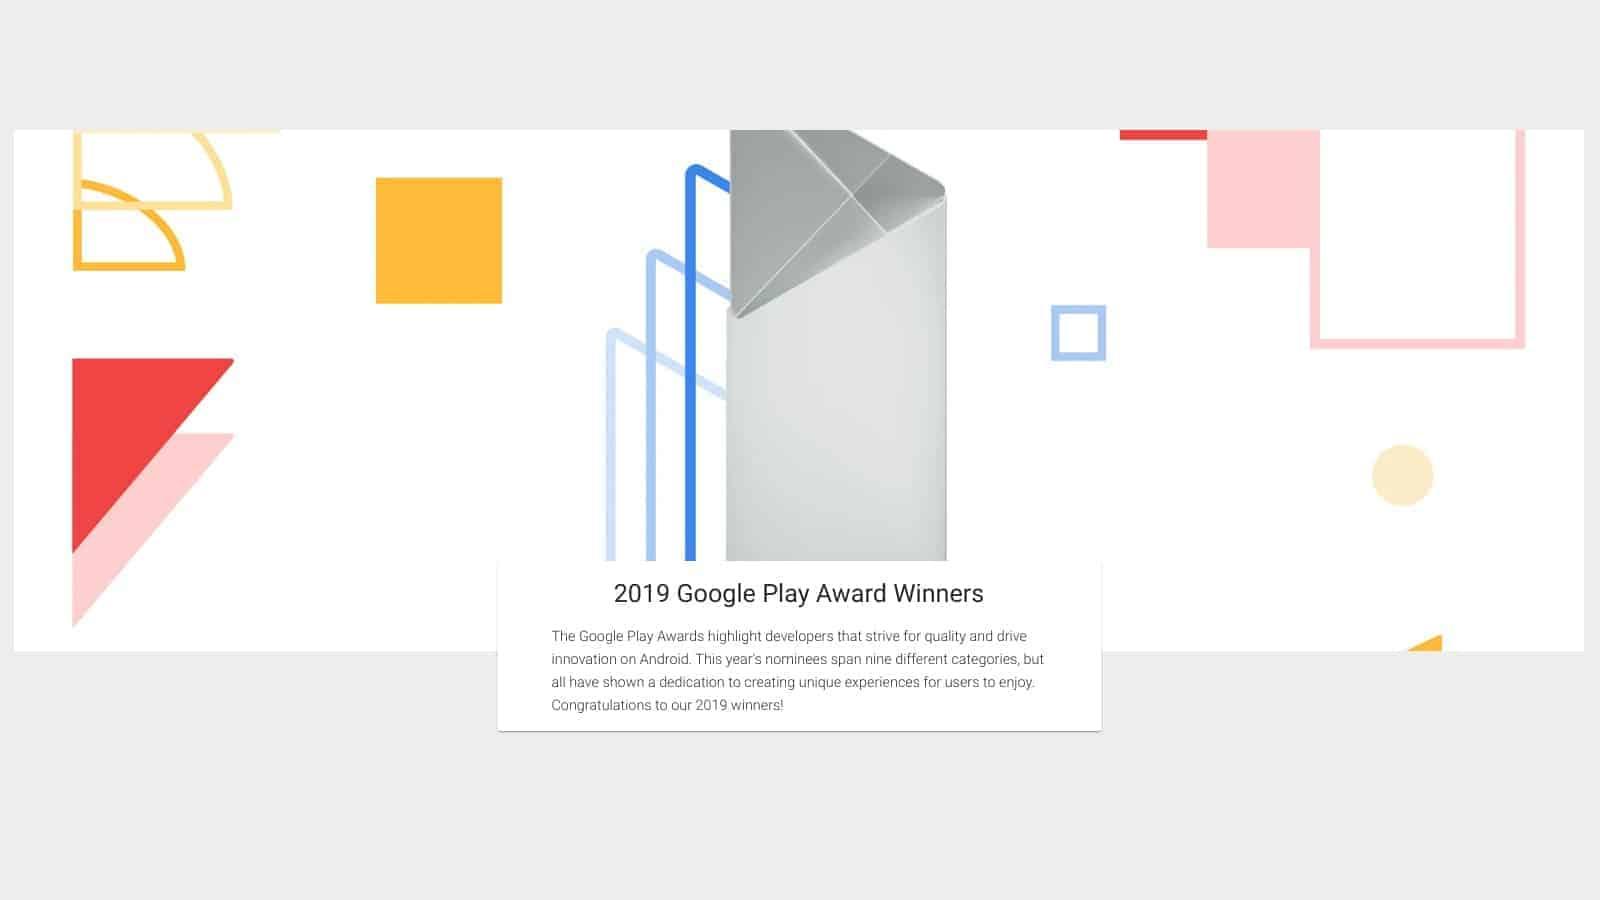 2019 Google Play Award winners 1